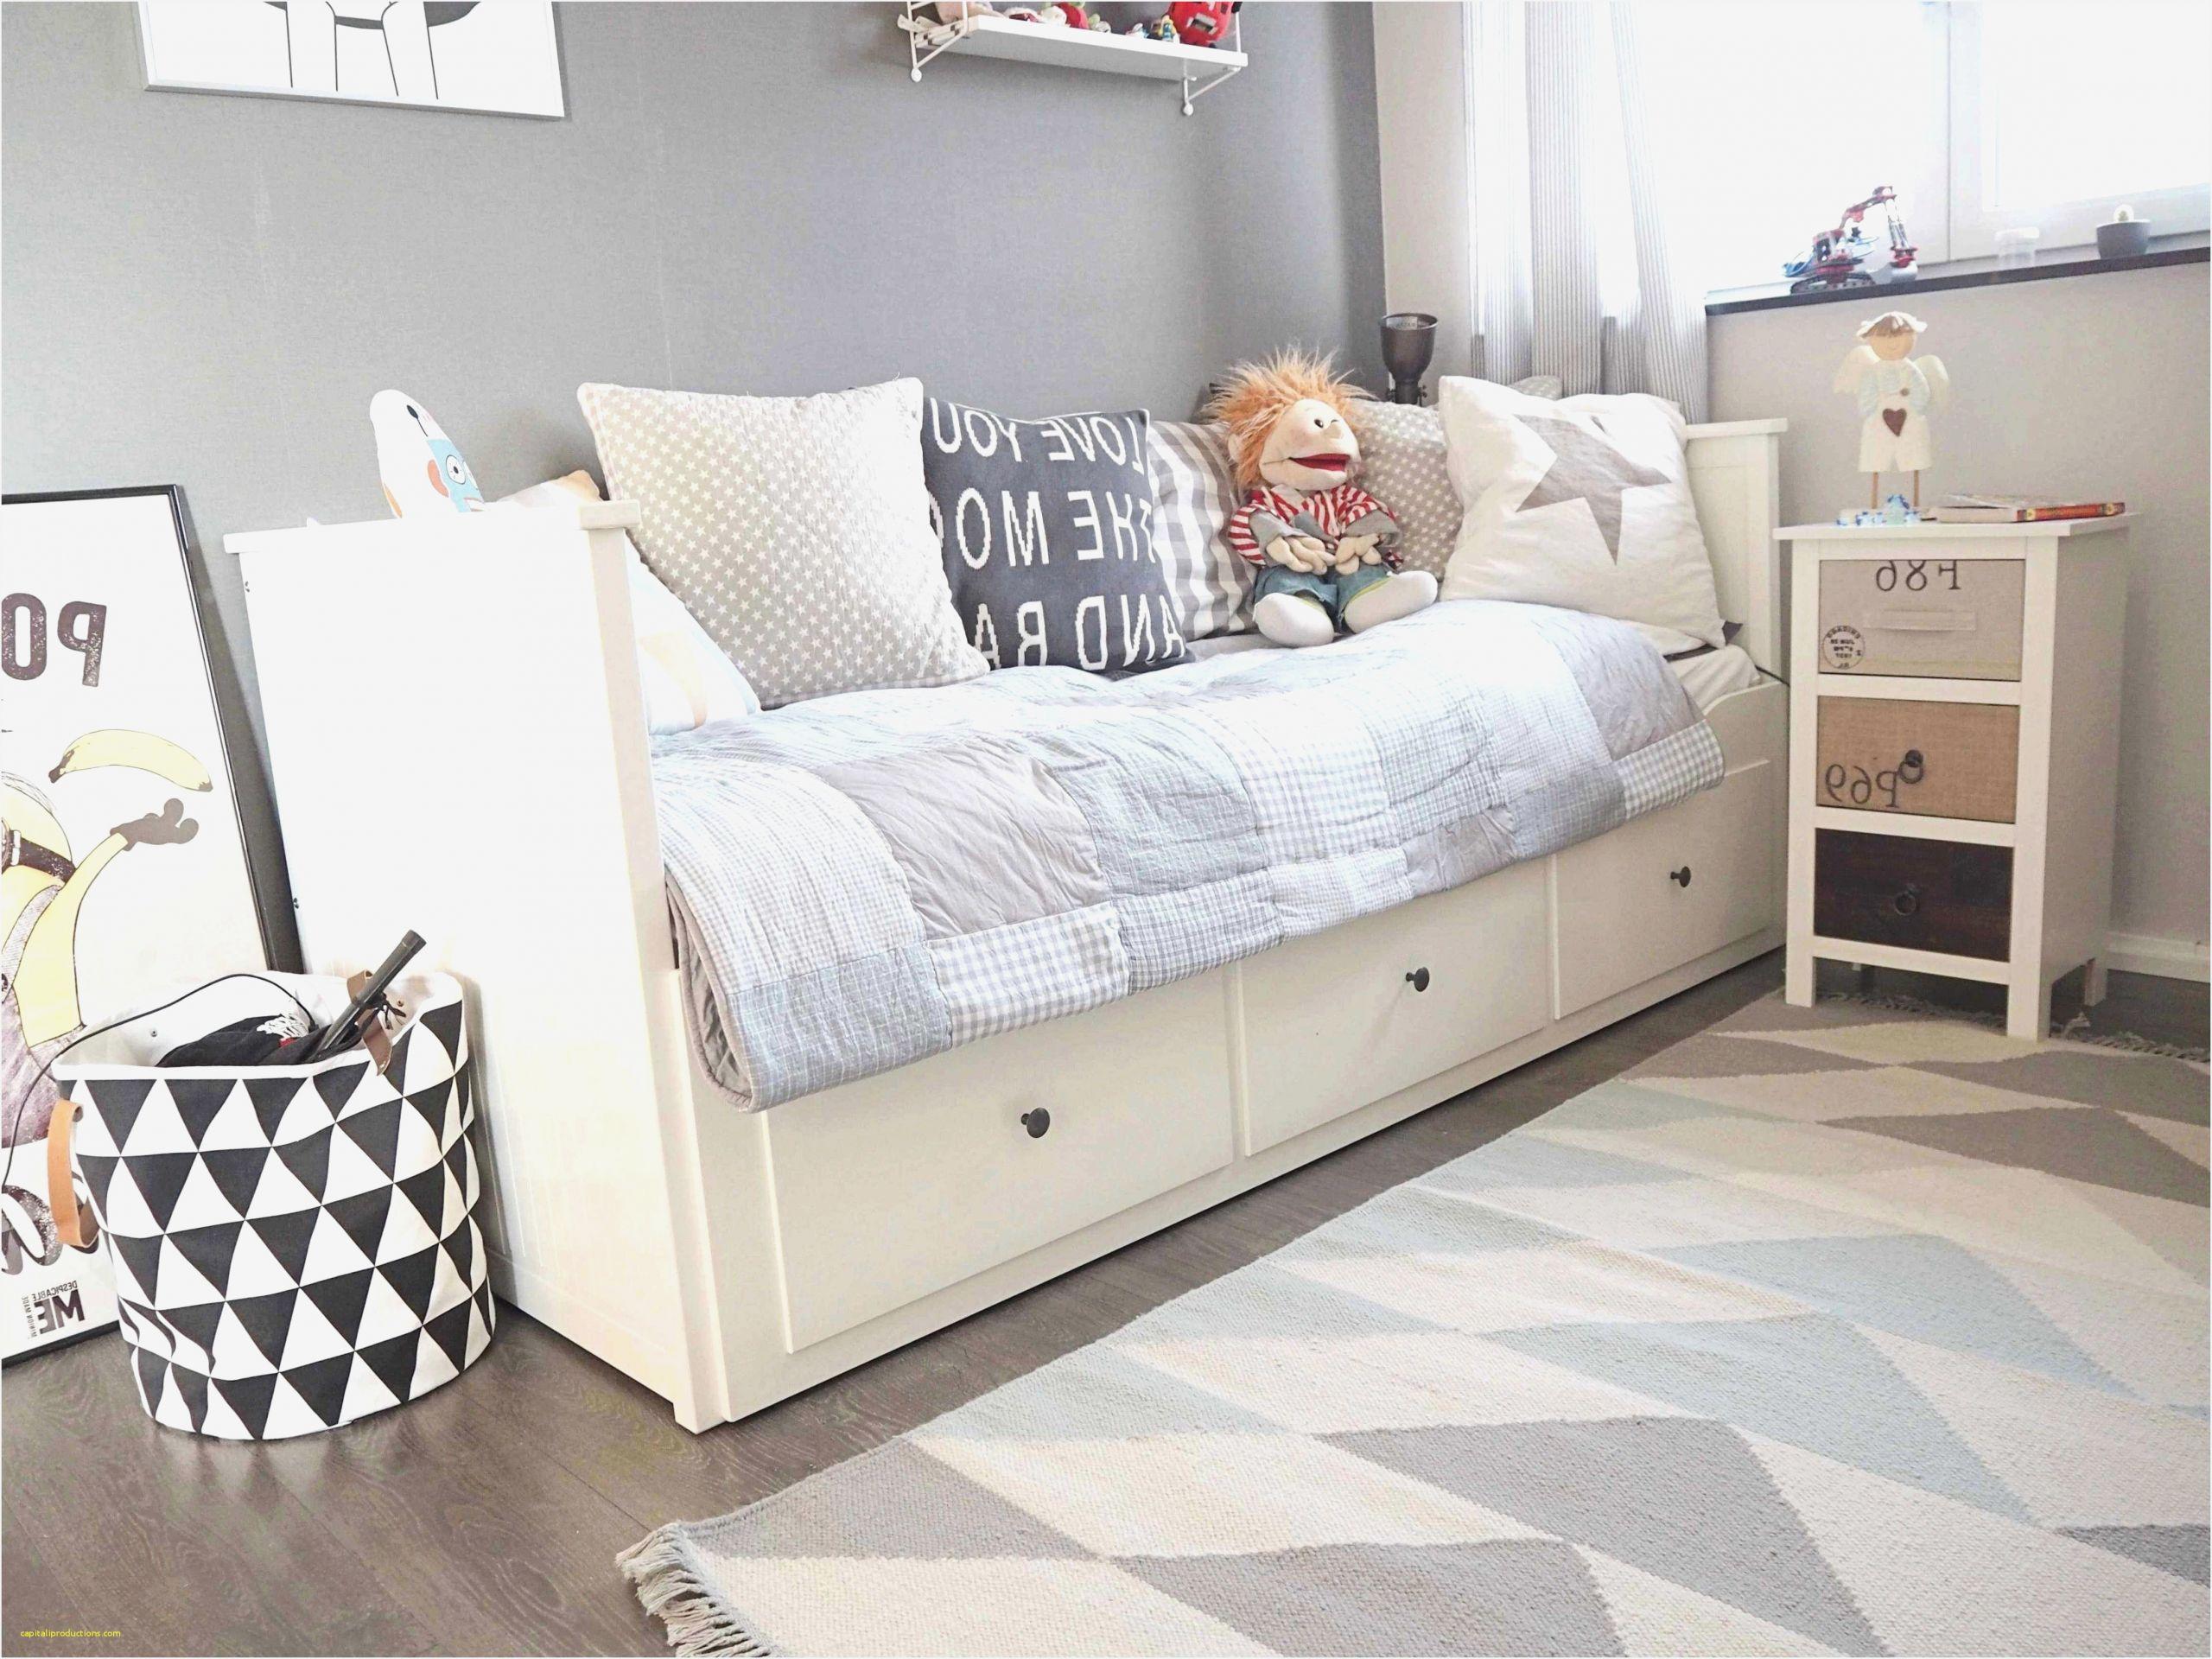 Full Size of Wandgestaltung Kinderzimmer Junge 6 Jahre Pirat Ikea Sofa Regal Weiß Regale Wohnzimmer Wandgestaltung Kinderzimmer Jungen